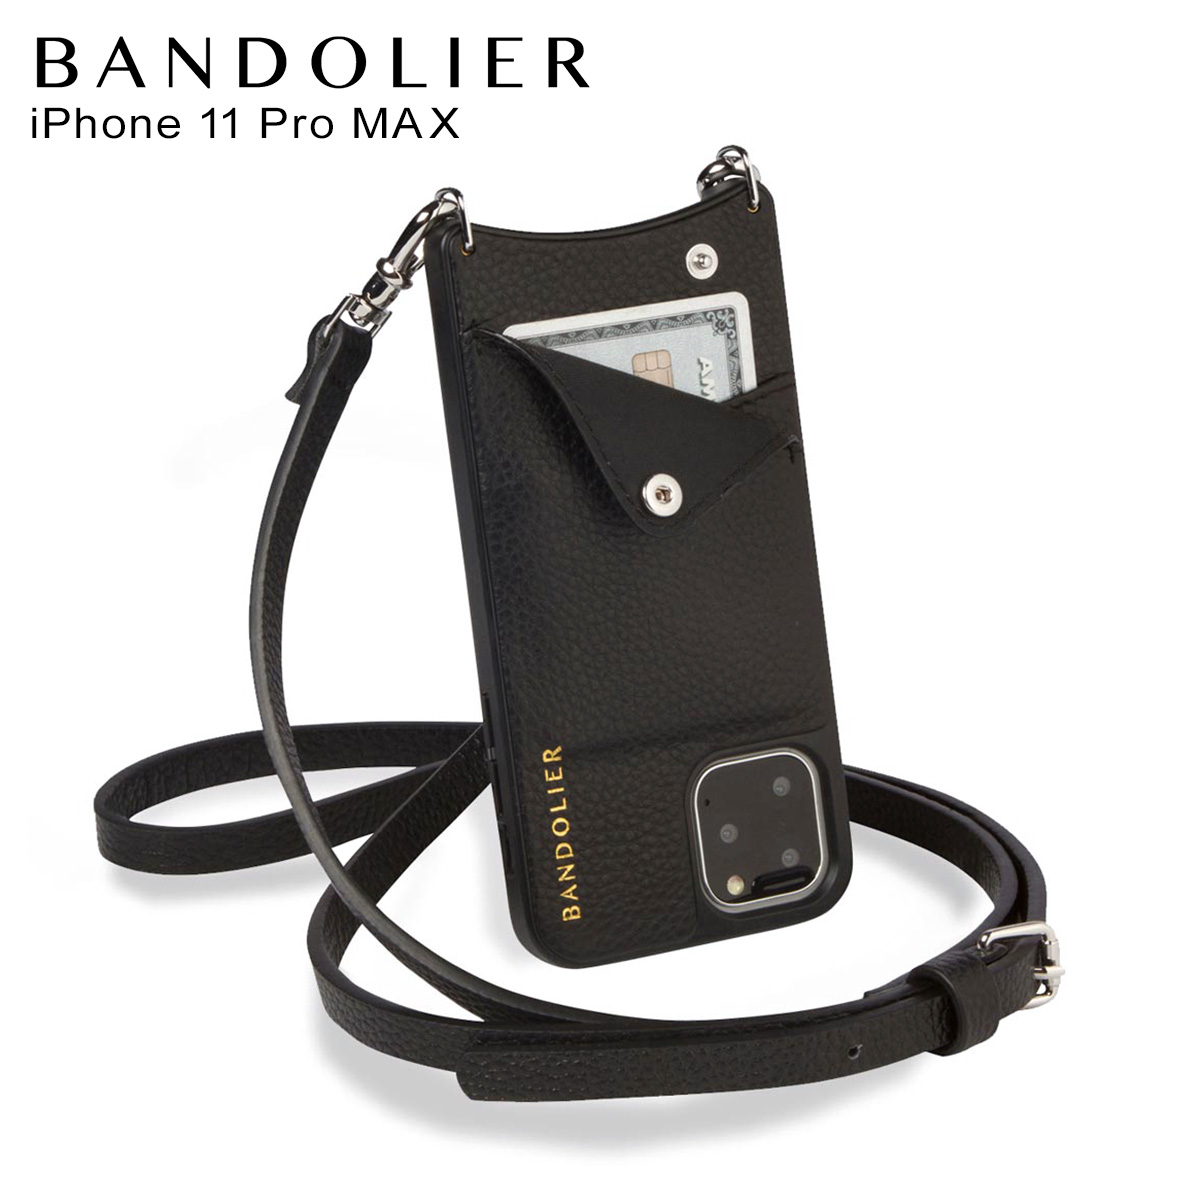 BANDOLIER バンドリヤー エマ シルバー iPhone11 Pro MAX ケース スマホ 携帯 ショルダー アイフォン メンズ レディース EMMA SILVER ブラック 黒 2910